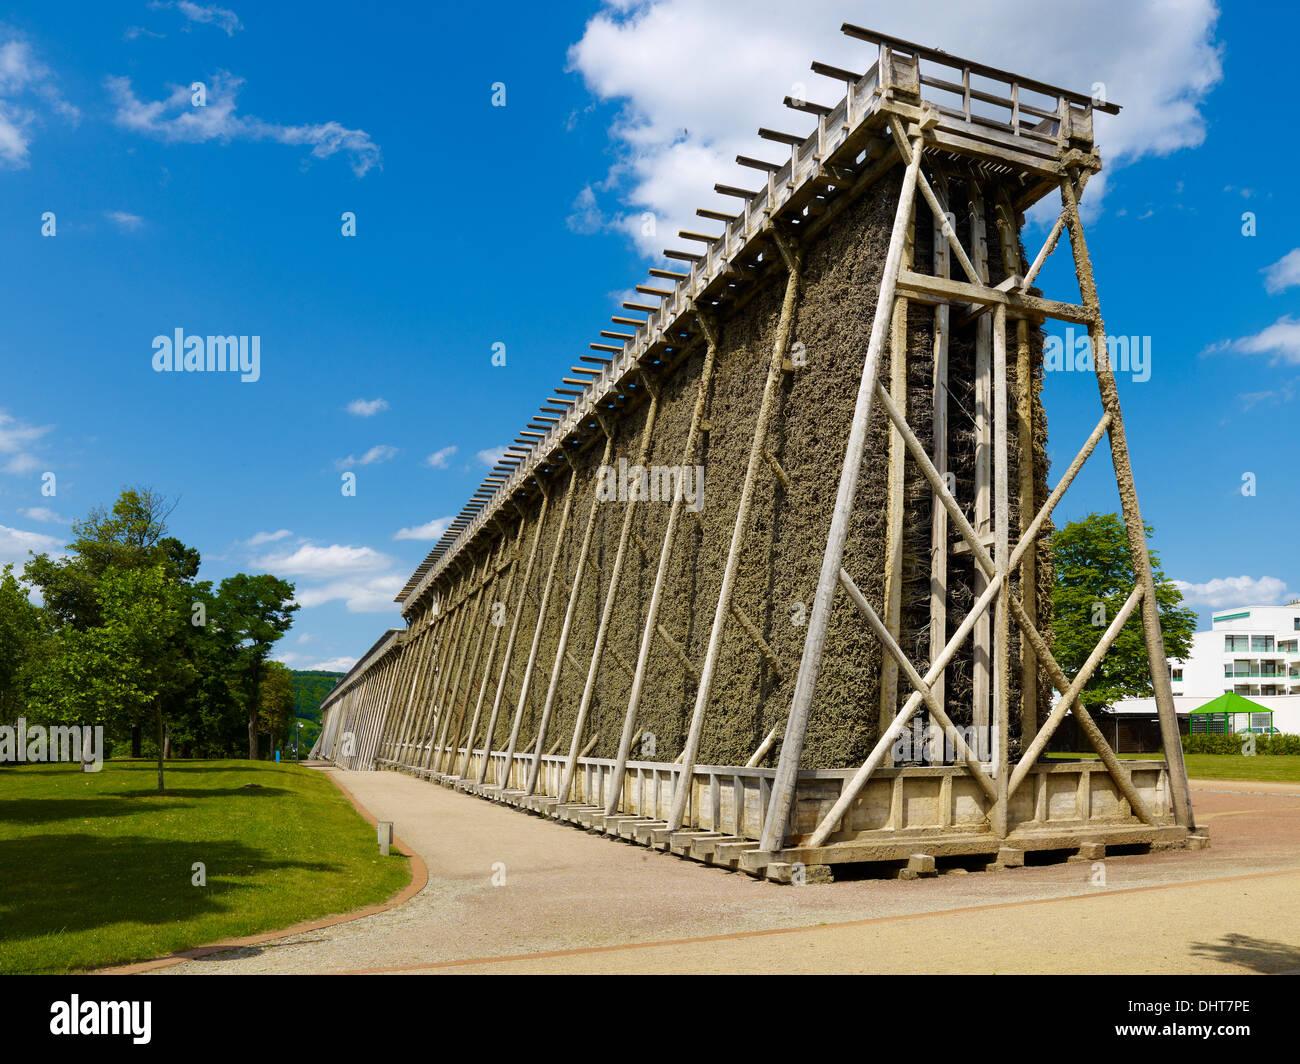 Graduation tower, Bad Kösen, Saxony-Anhalt, Germany - Stock Image